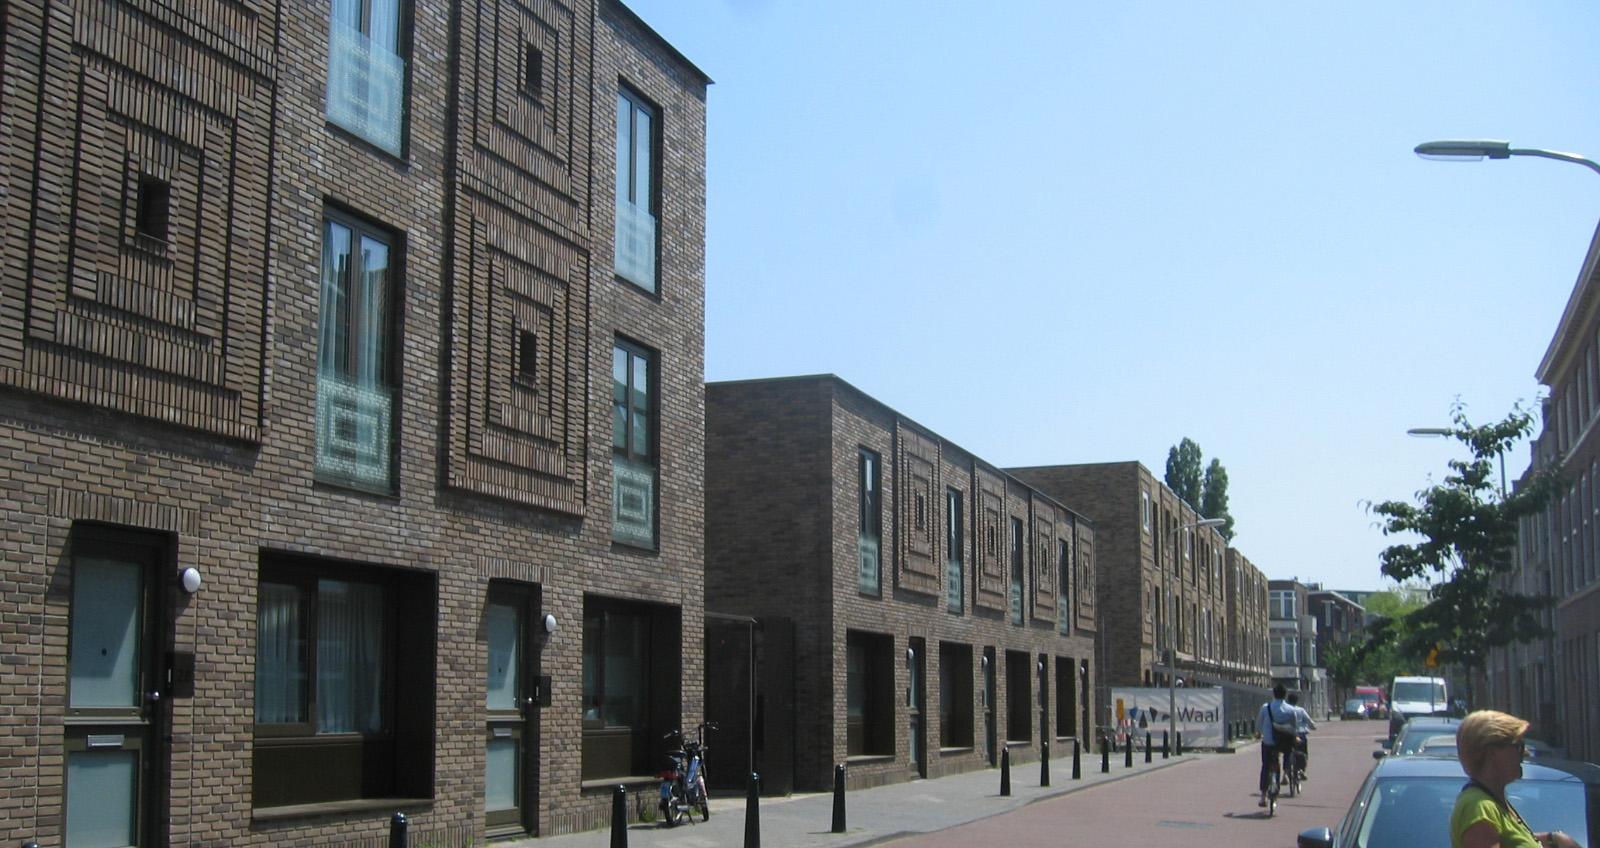 woningen-maasstraat-den-haag